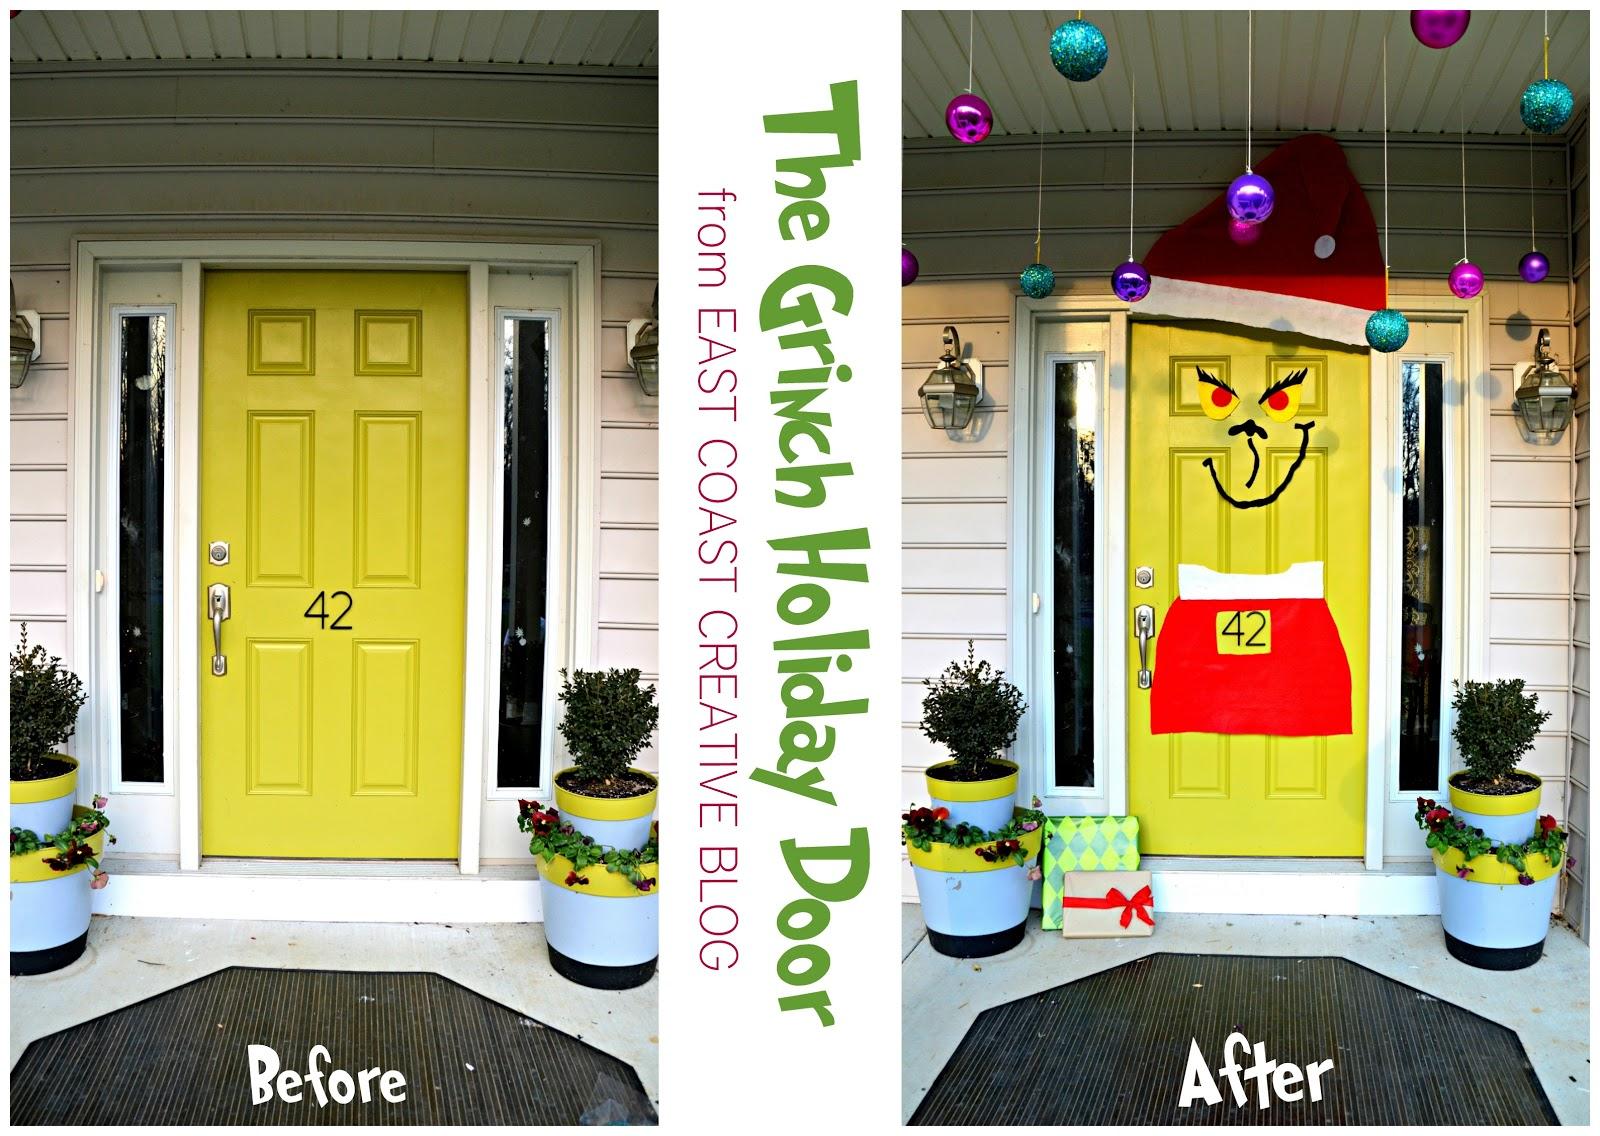 & The Grinch Front Door Christmas 2012 - East Coast Creative Blog